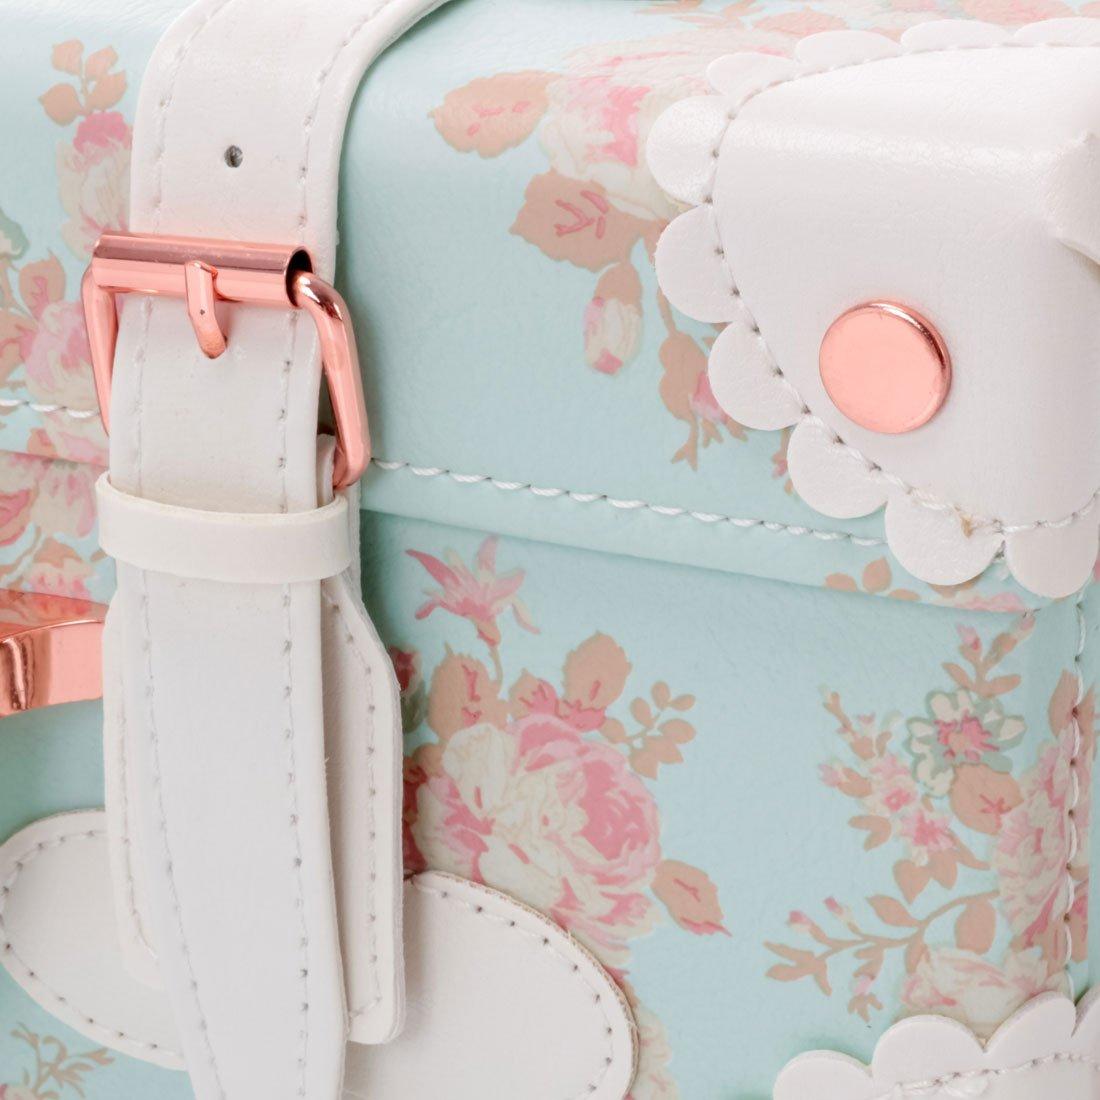 83e00e4479fa 13 Inch Women Pu Leather Small Suitcase Floral Decorative Box with 2 ...